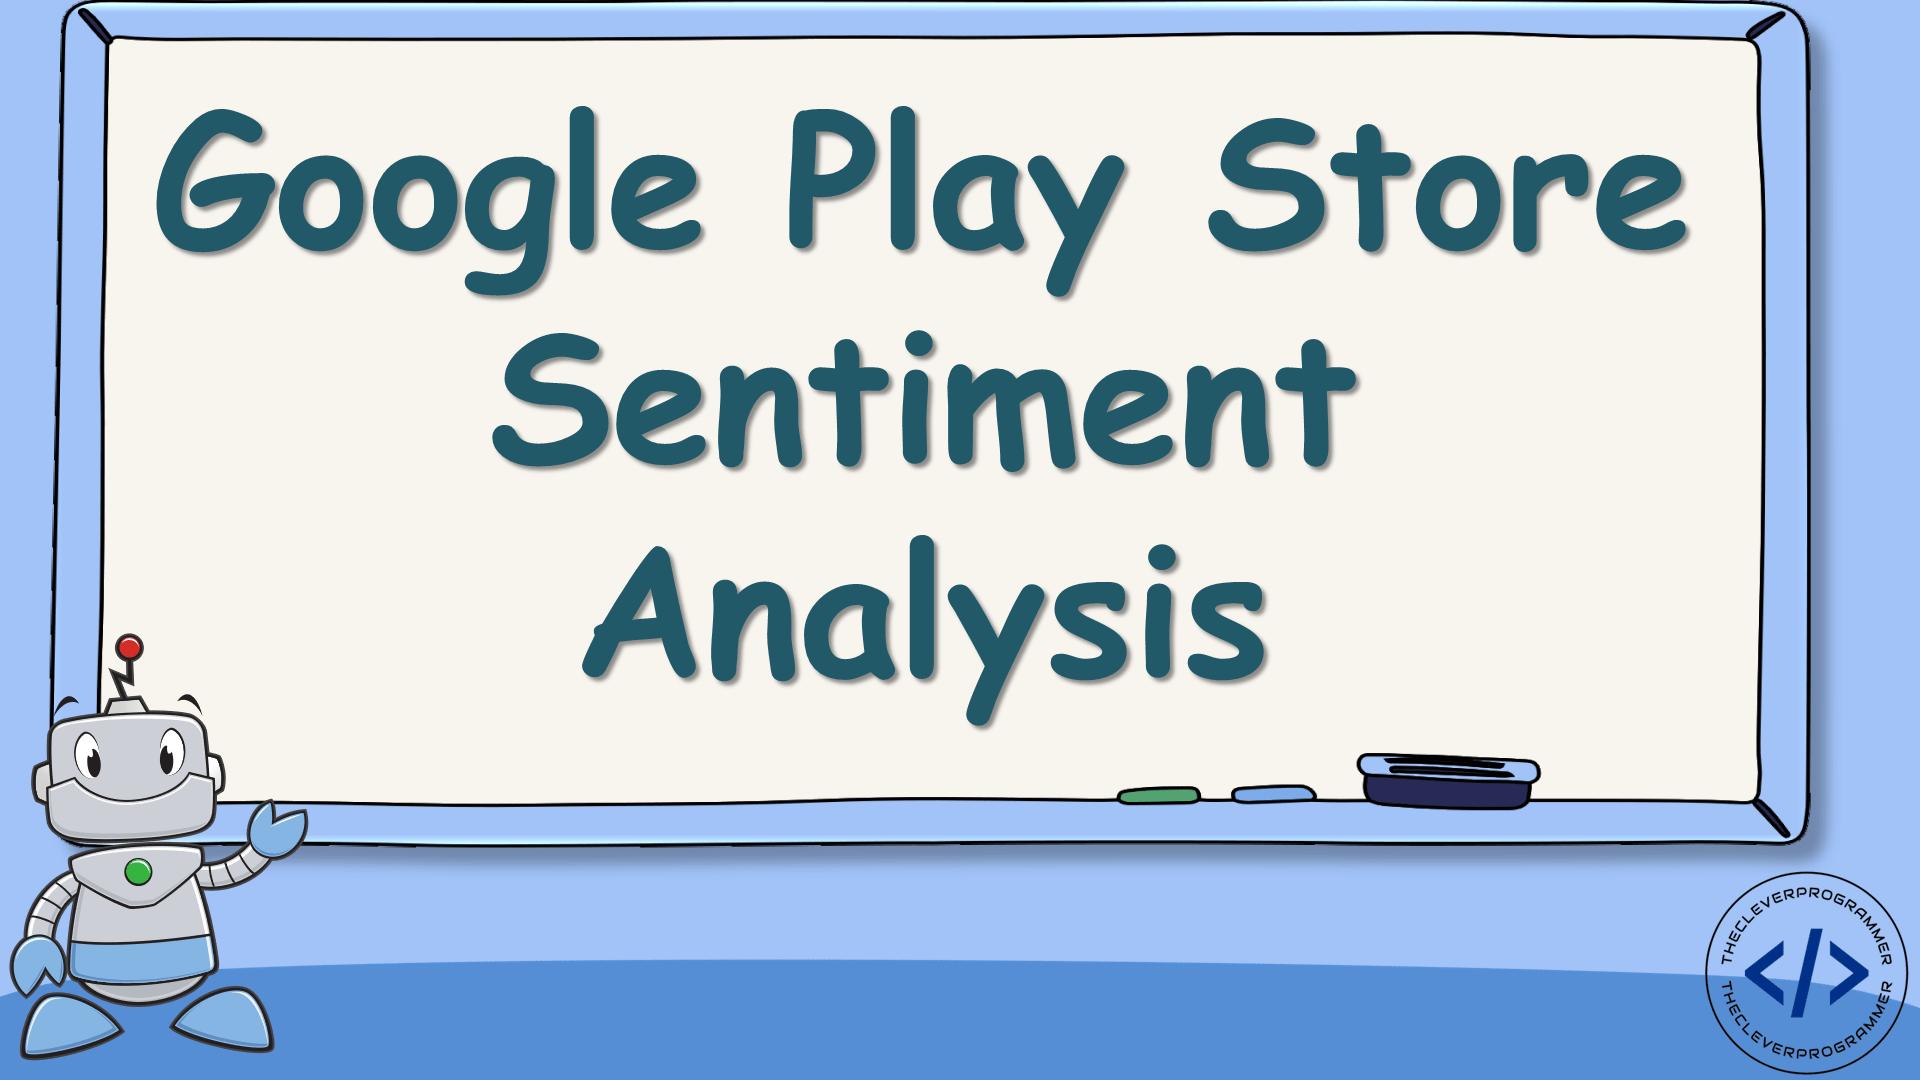 Google Play Store Sentiment Analysis using Python